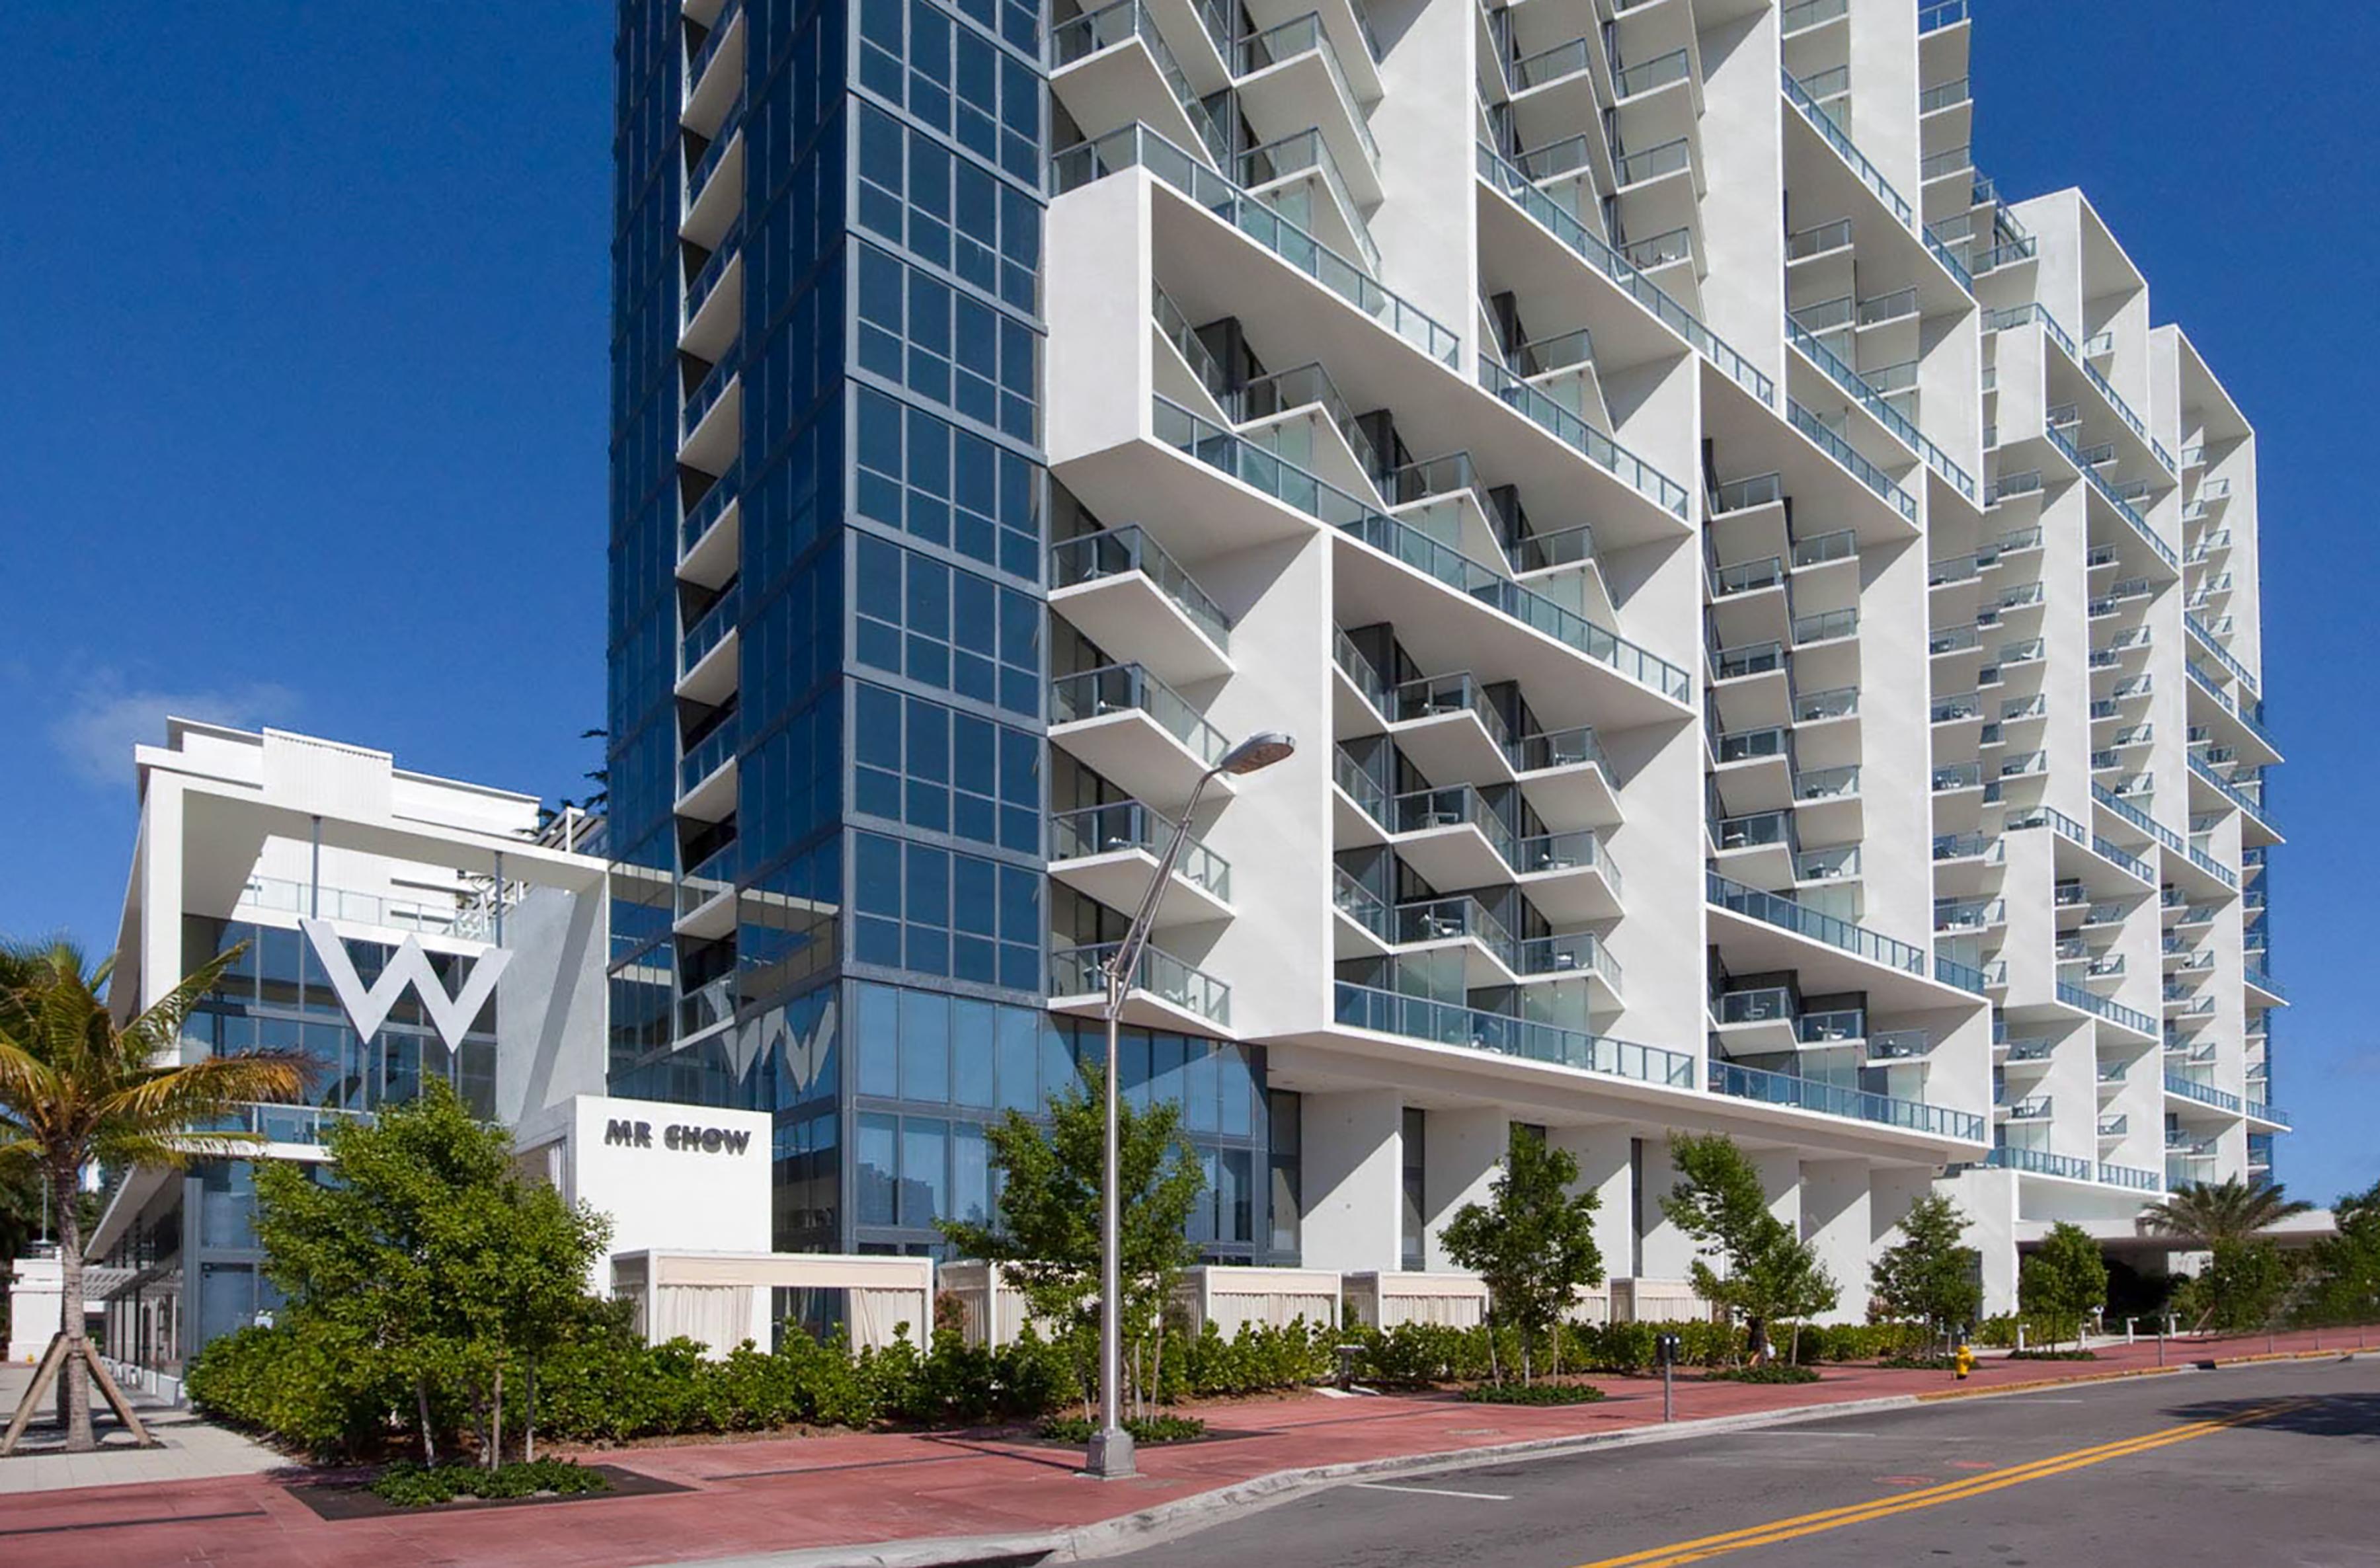 Condomínio para Venda às Condominium 2201 Collins Ave. Unit 822 Miami Beach, Florida 33138 Estados Unidos